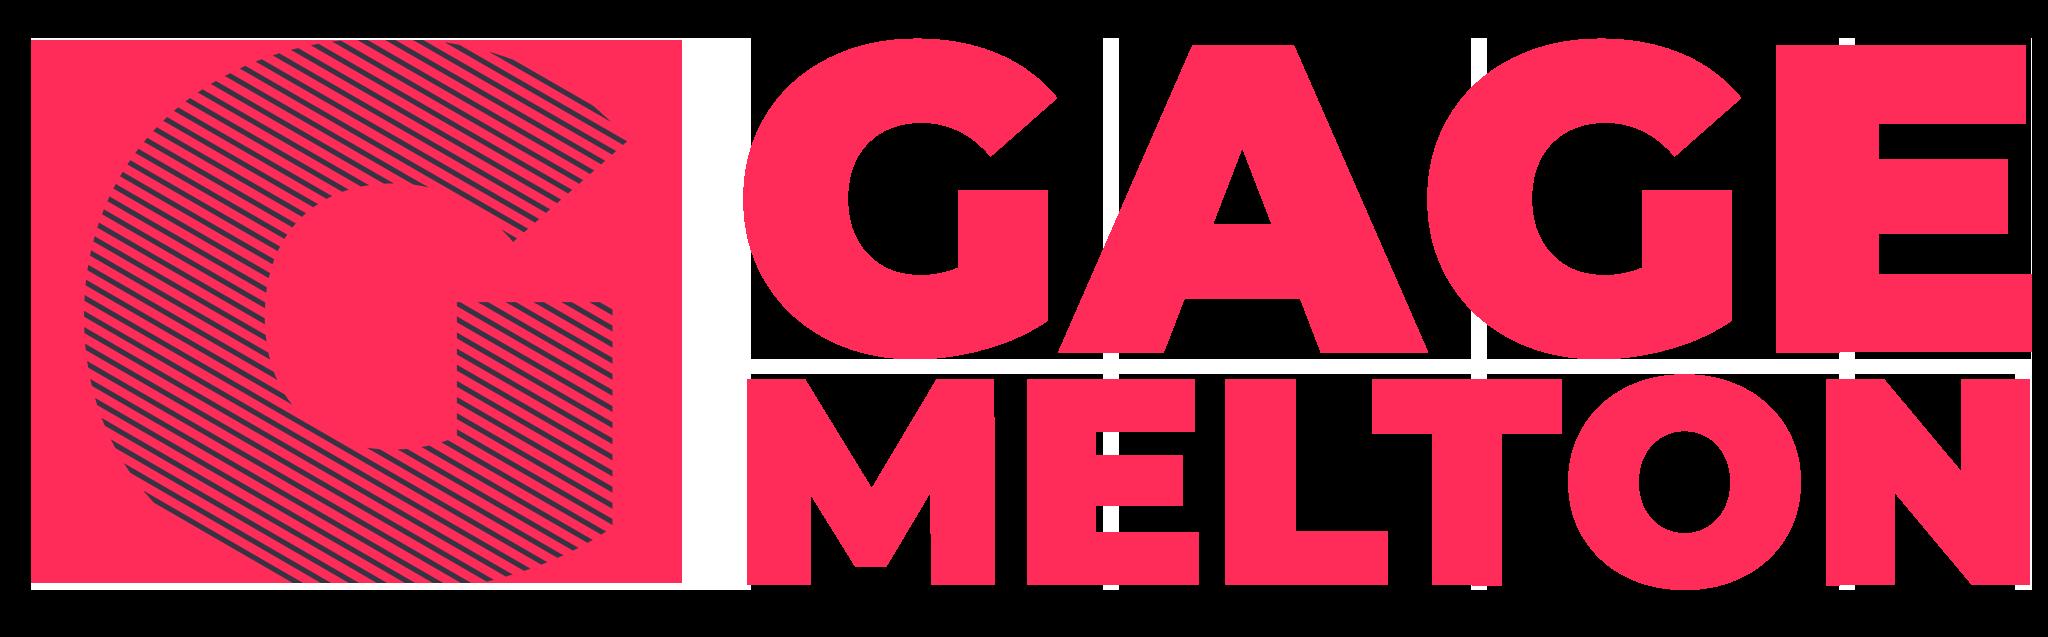 Gage Melton